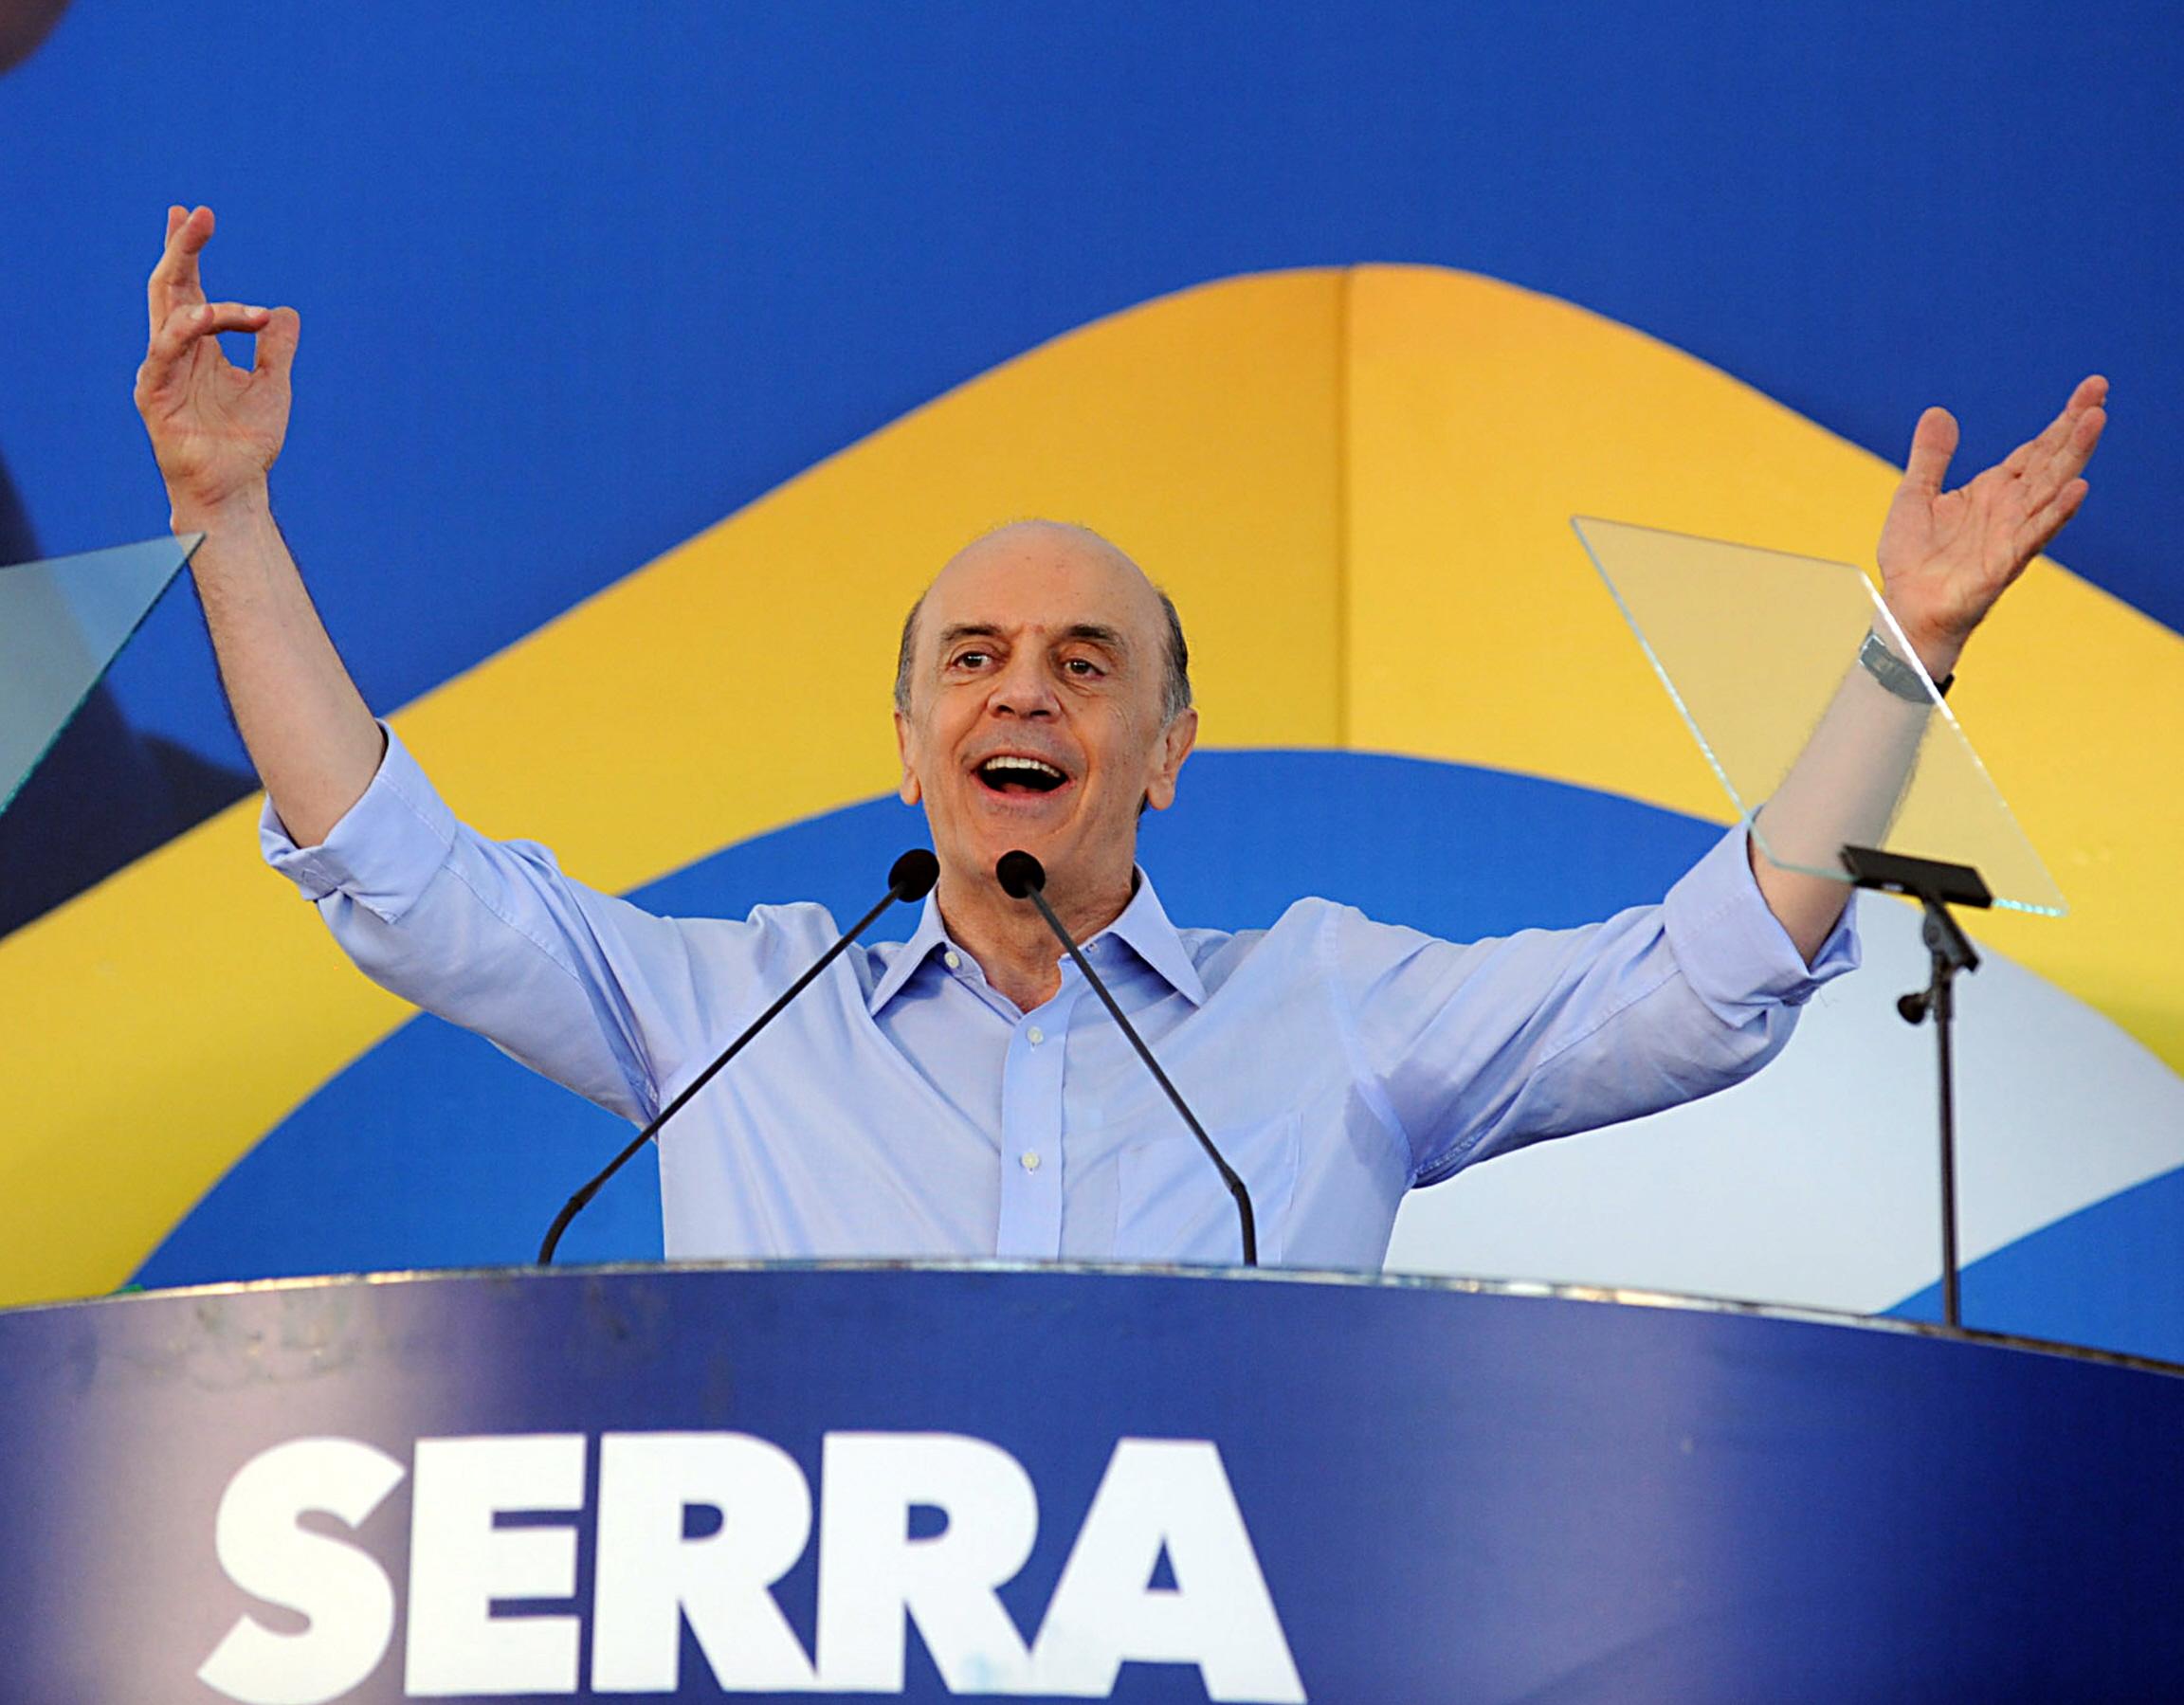 Resultado de imagem para José Serra 2010